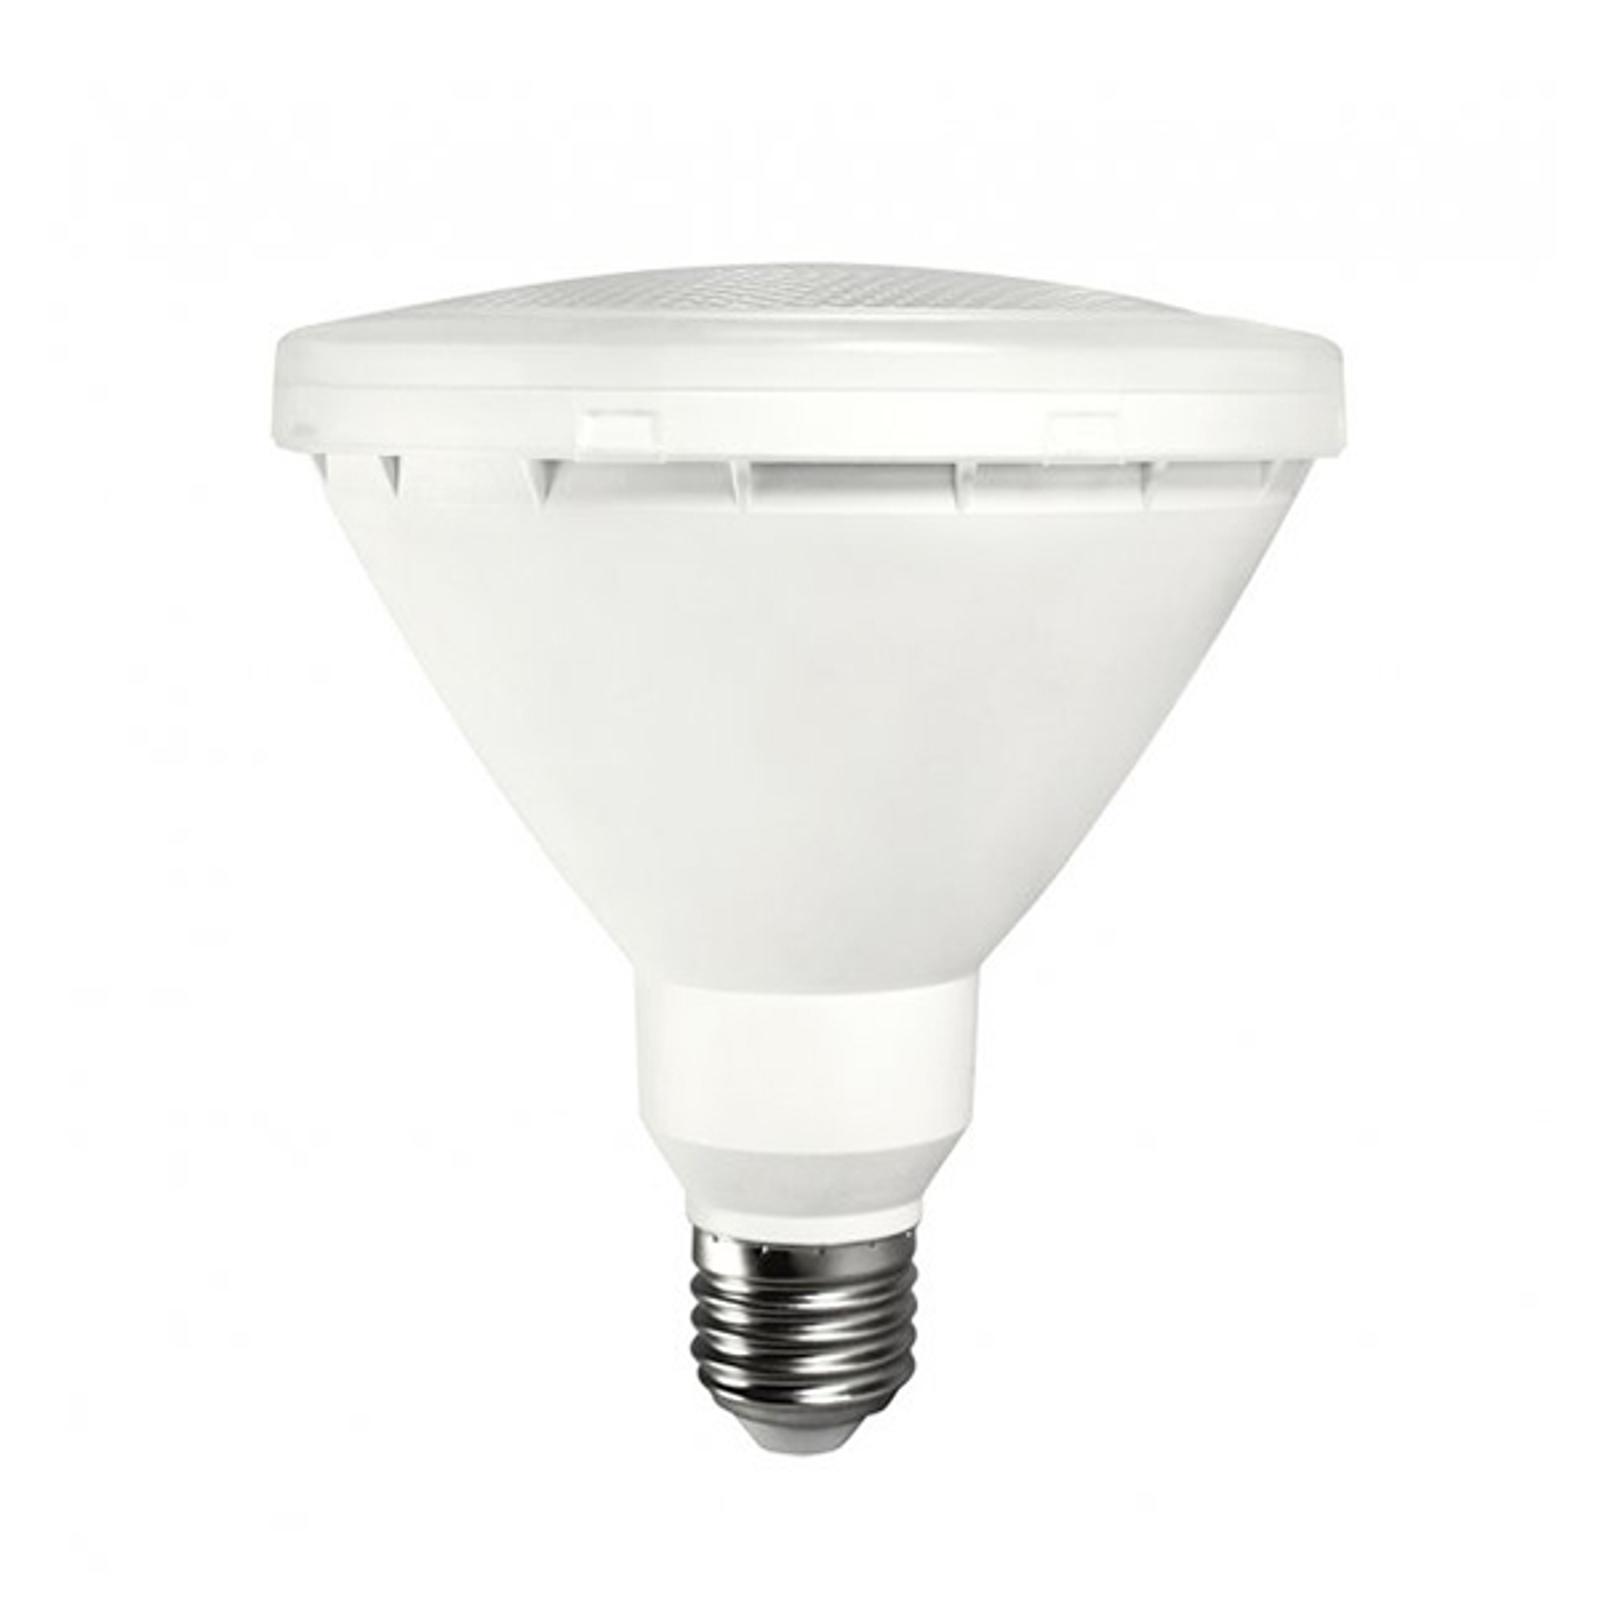 E27 15W 827 LED reflektor RODER PAR38 vodotěsný